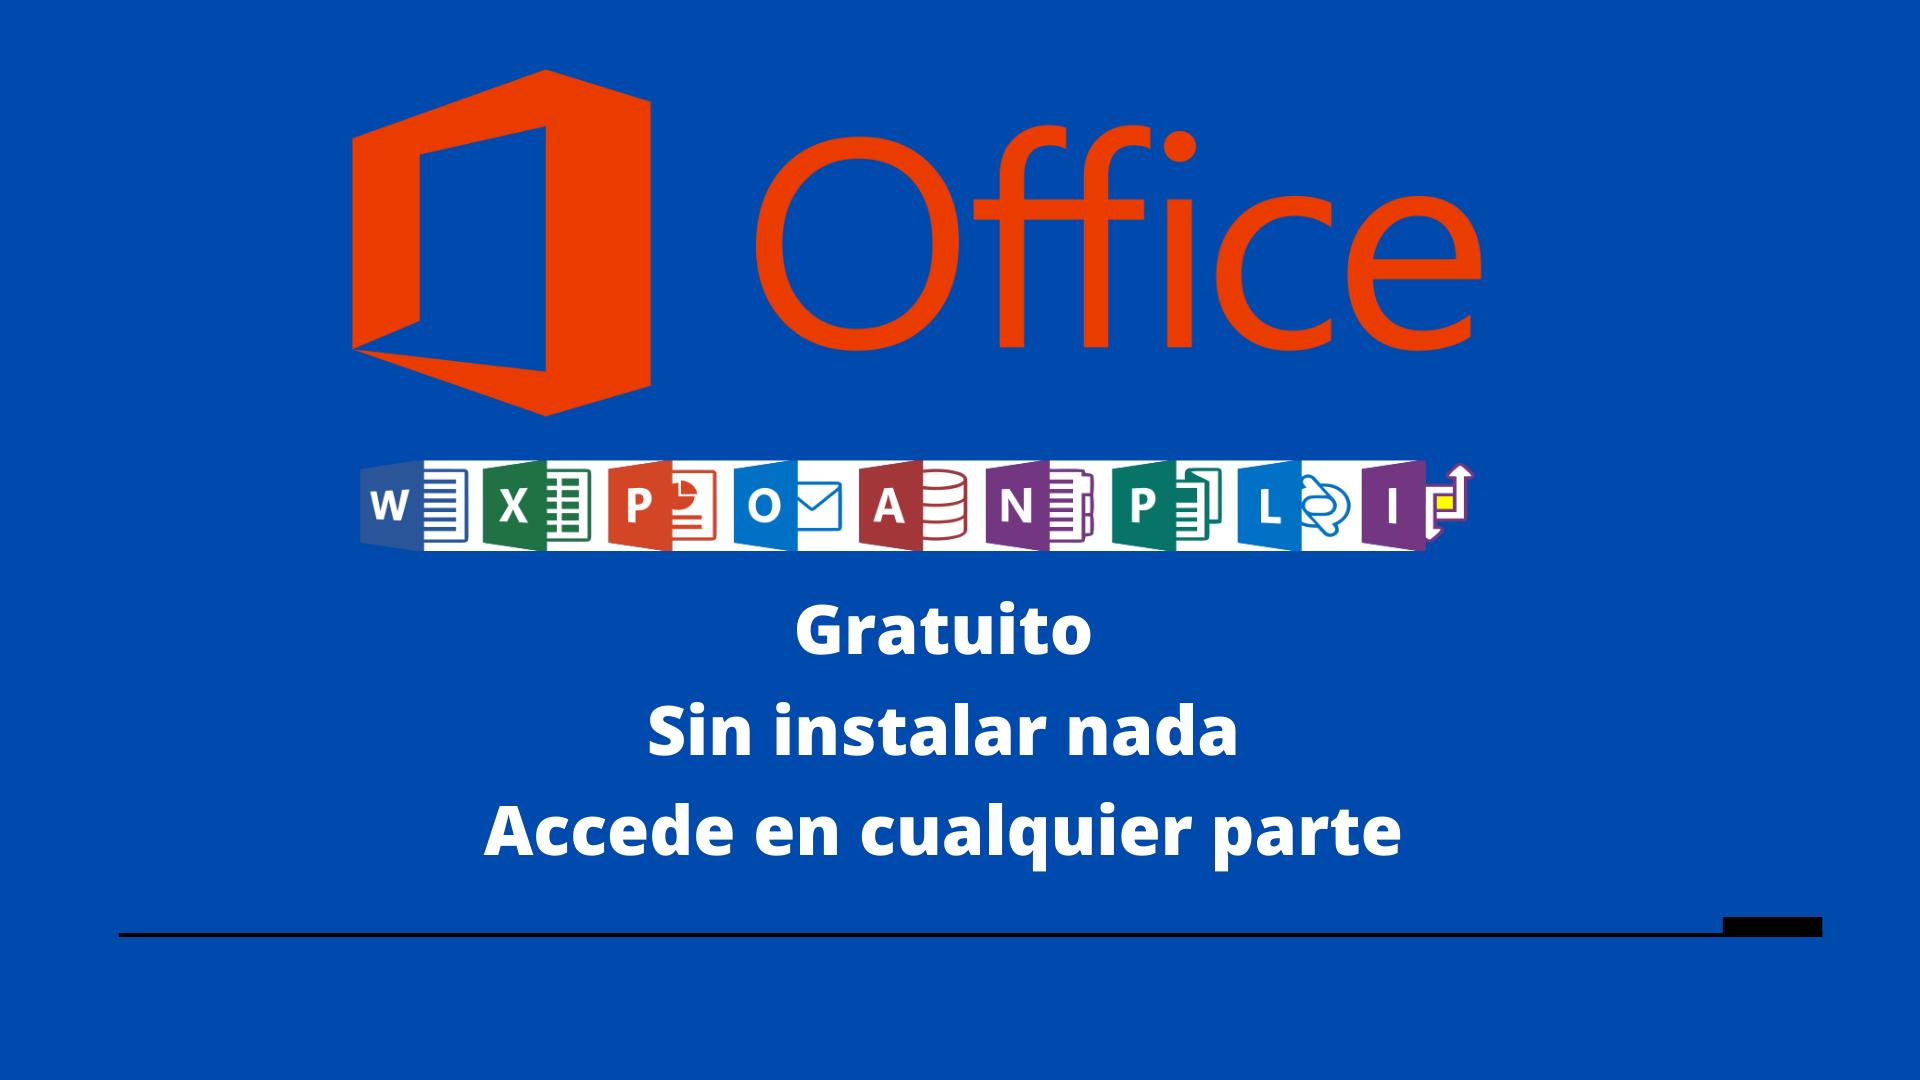 Miniatura Pildora Office Online